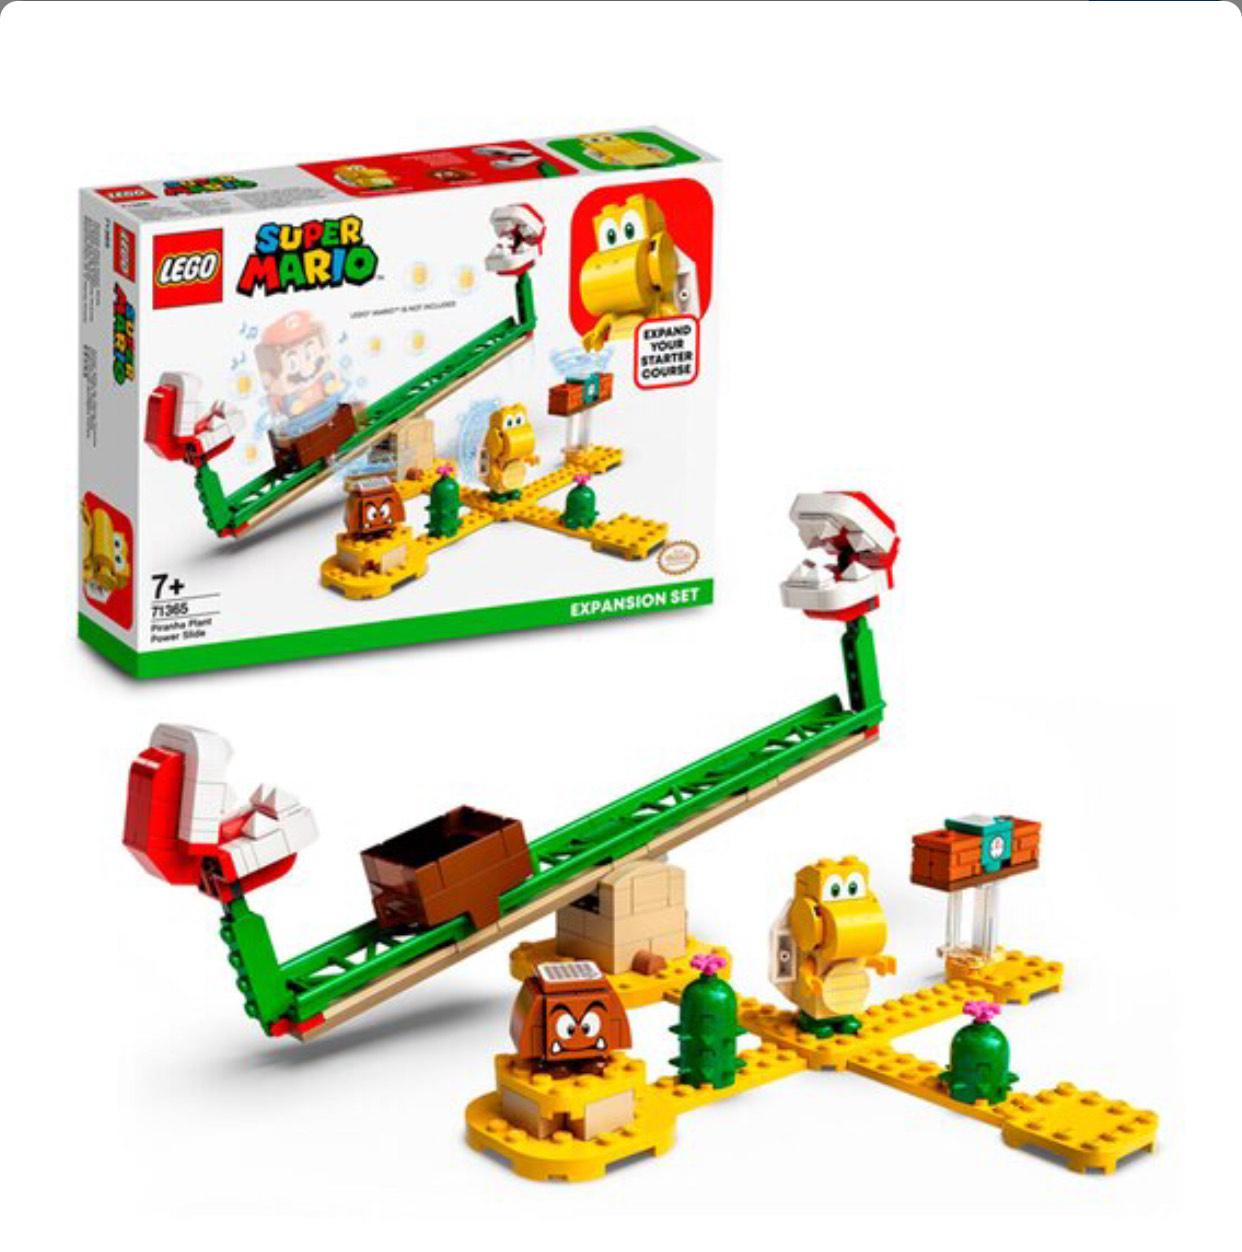 LEGO Piranha Plant Power Slide Set 71365 at Tesco - £13.75